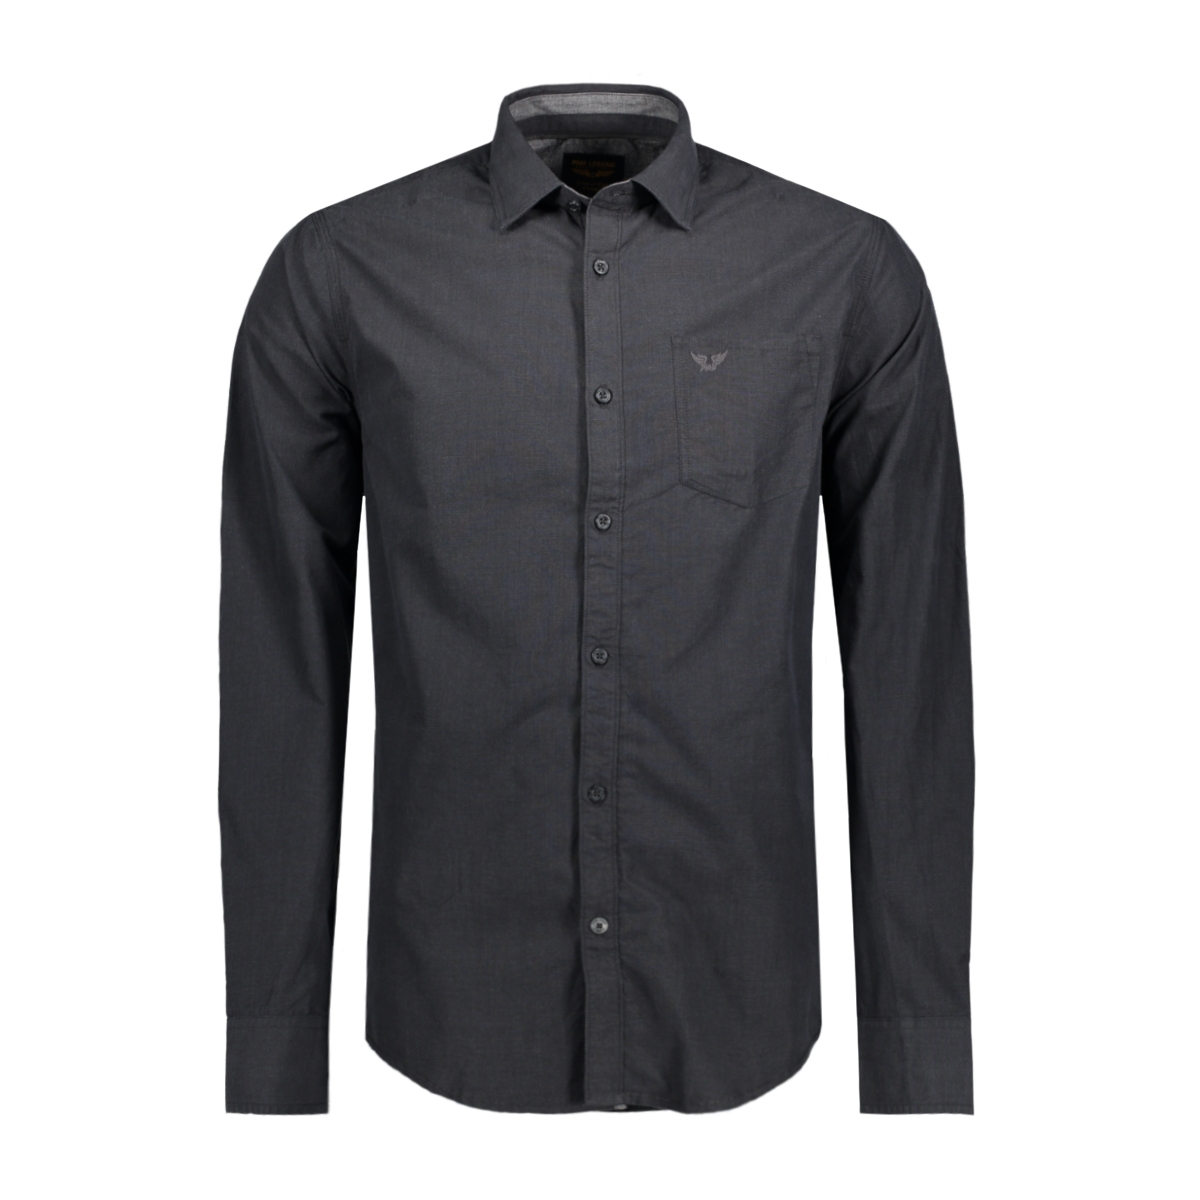 psi00292 pme legend overhemd 985